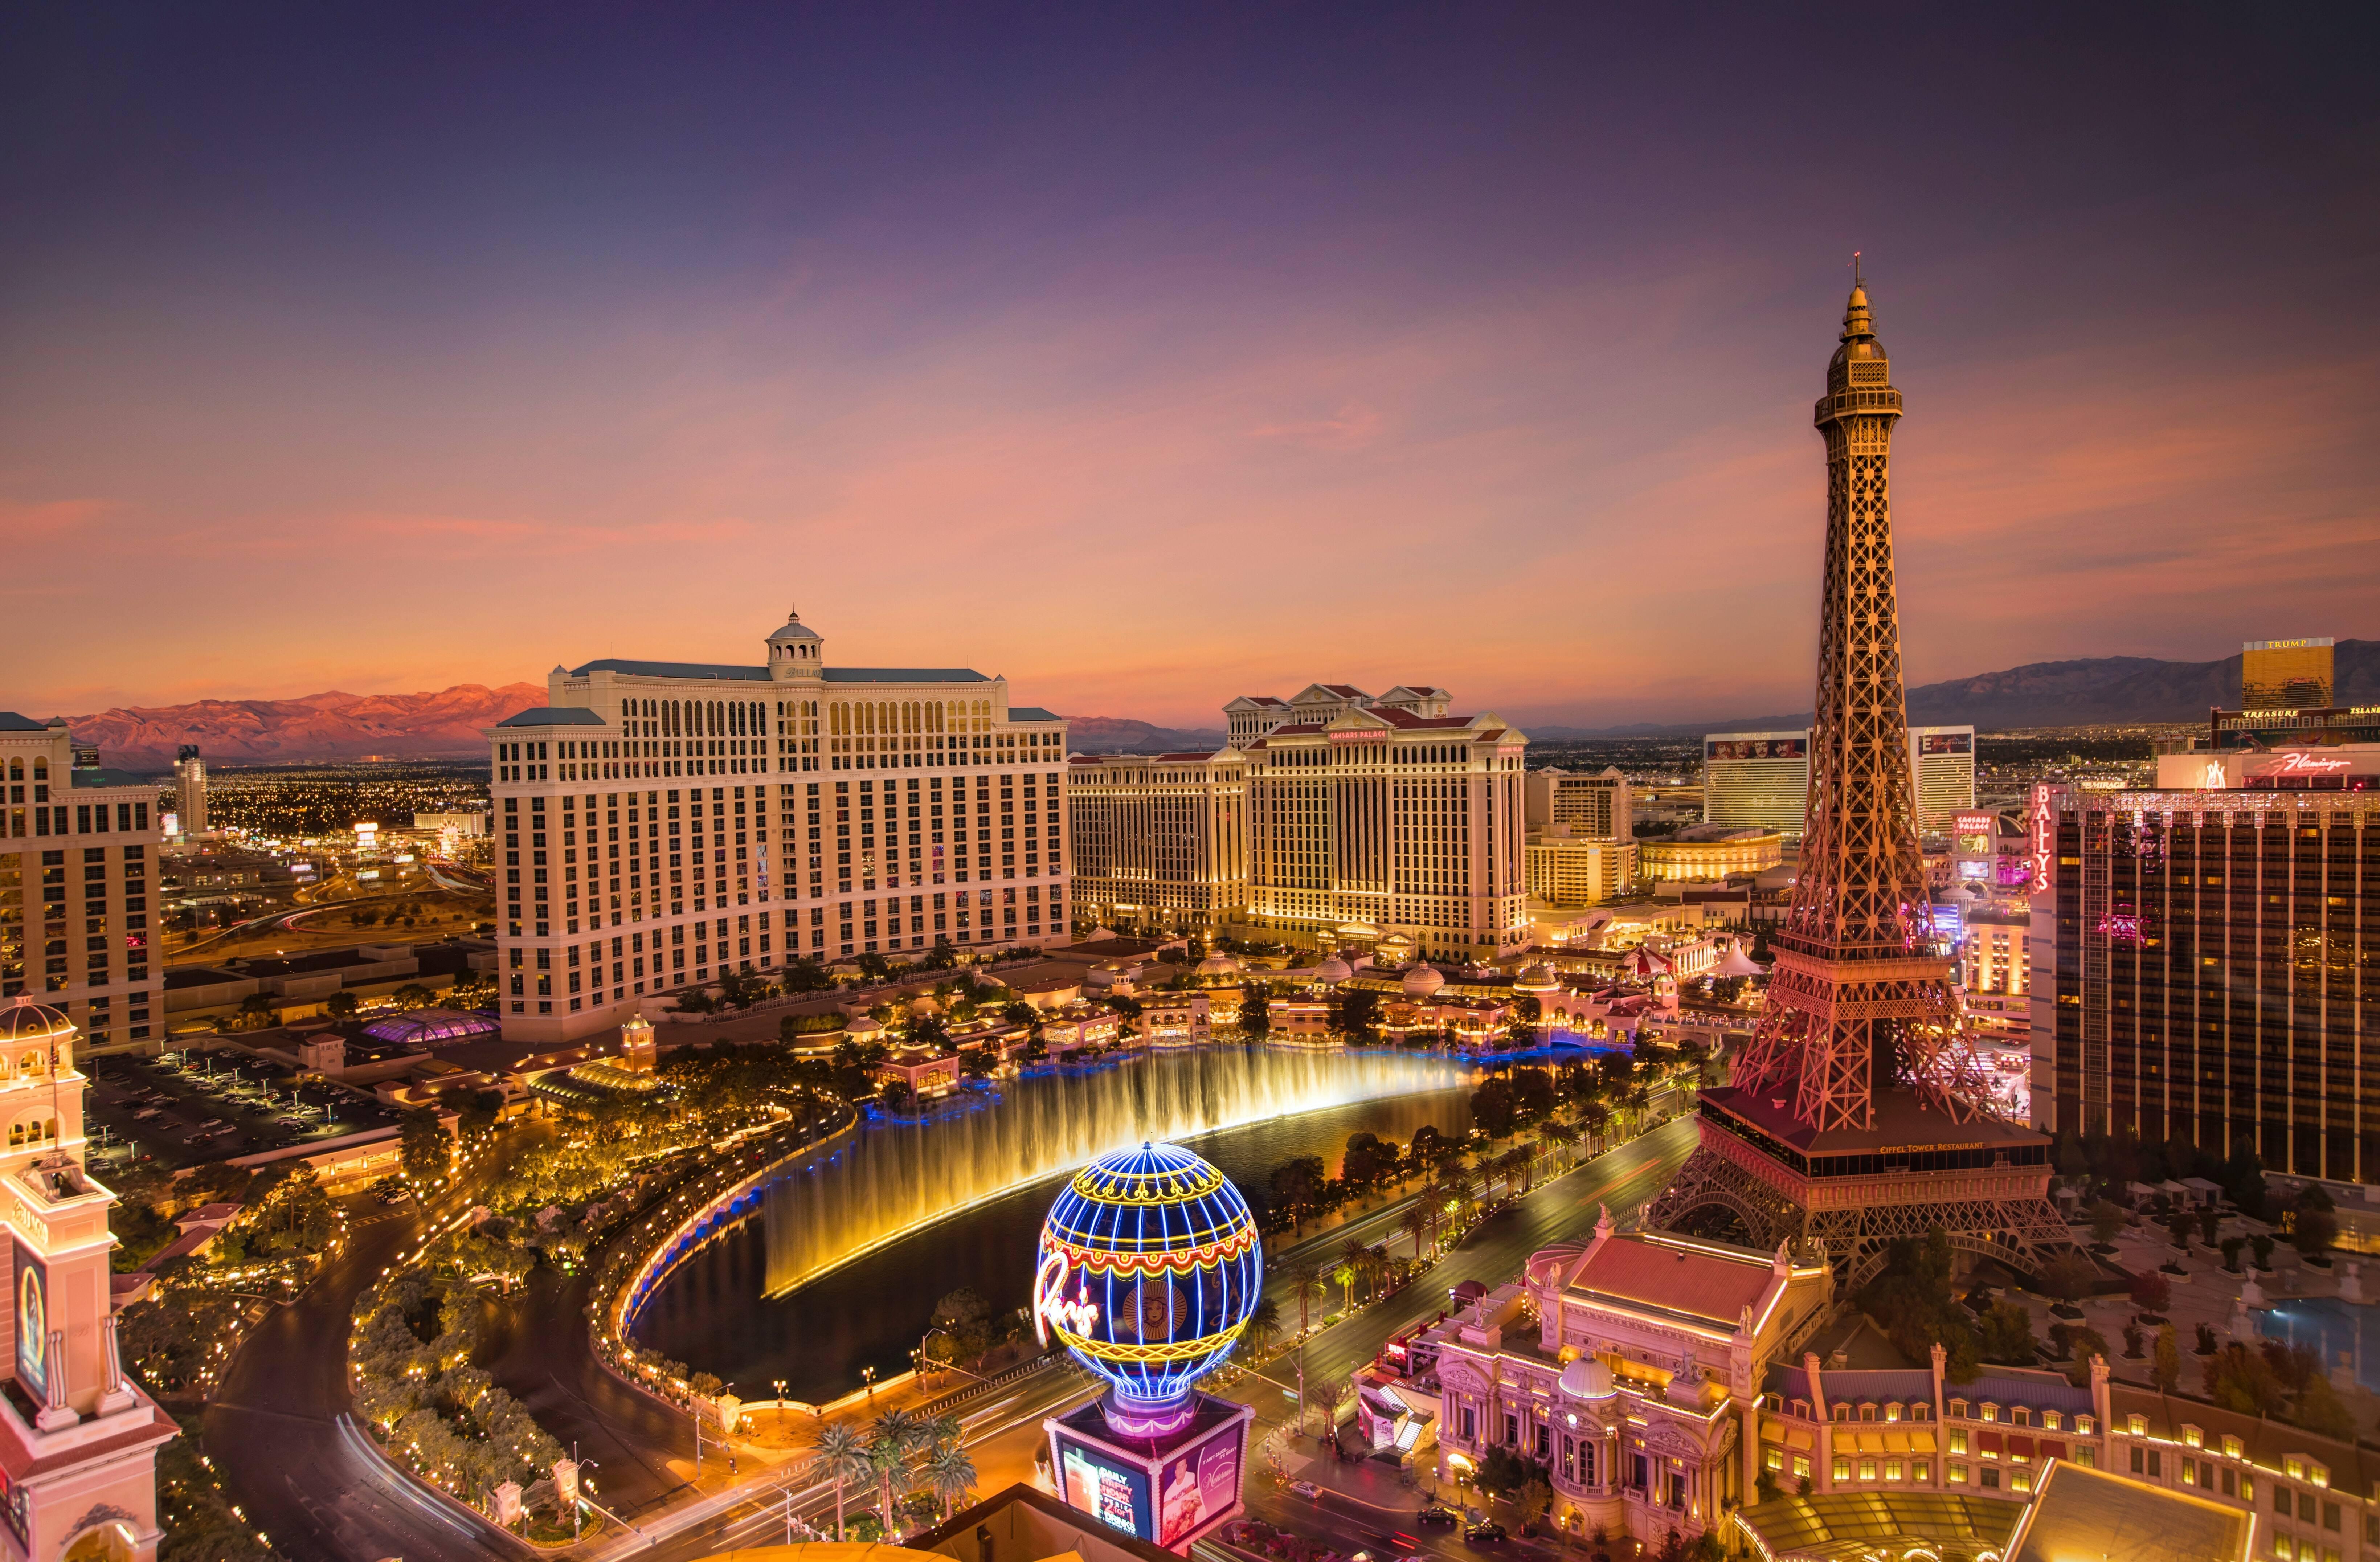 Turismo em Las Vegas. Foto: Unsplash